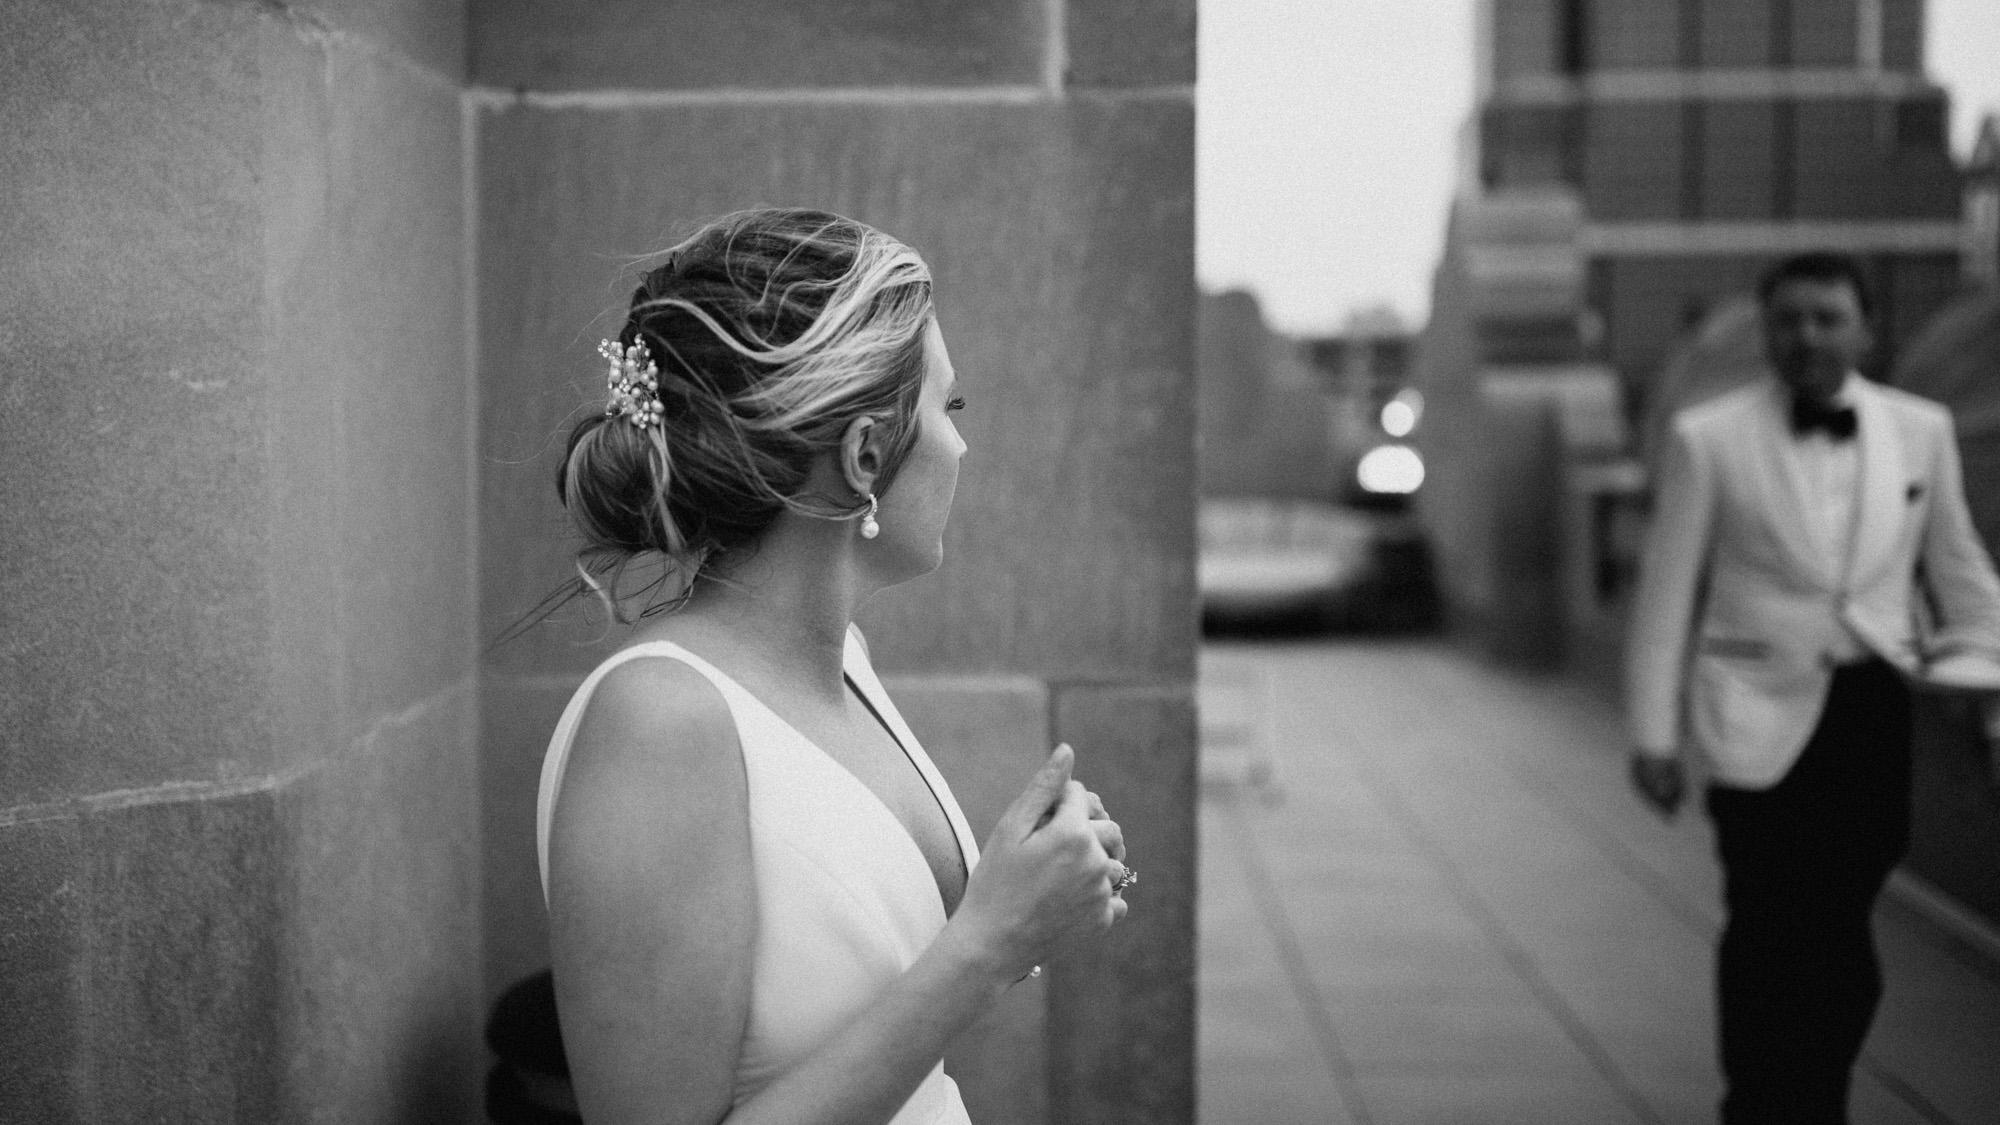 Alec_Vanderboom_kansas_city_hip_wedding_photos-0073.jpg